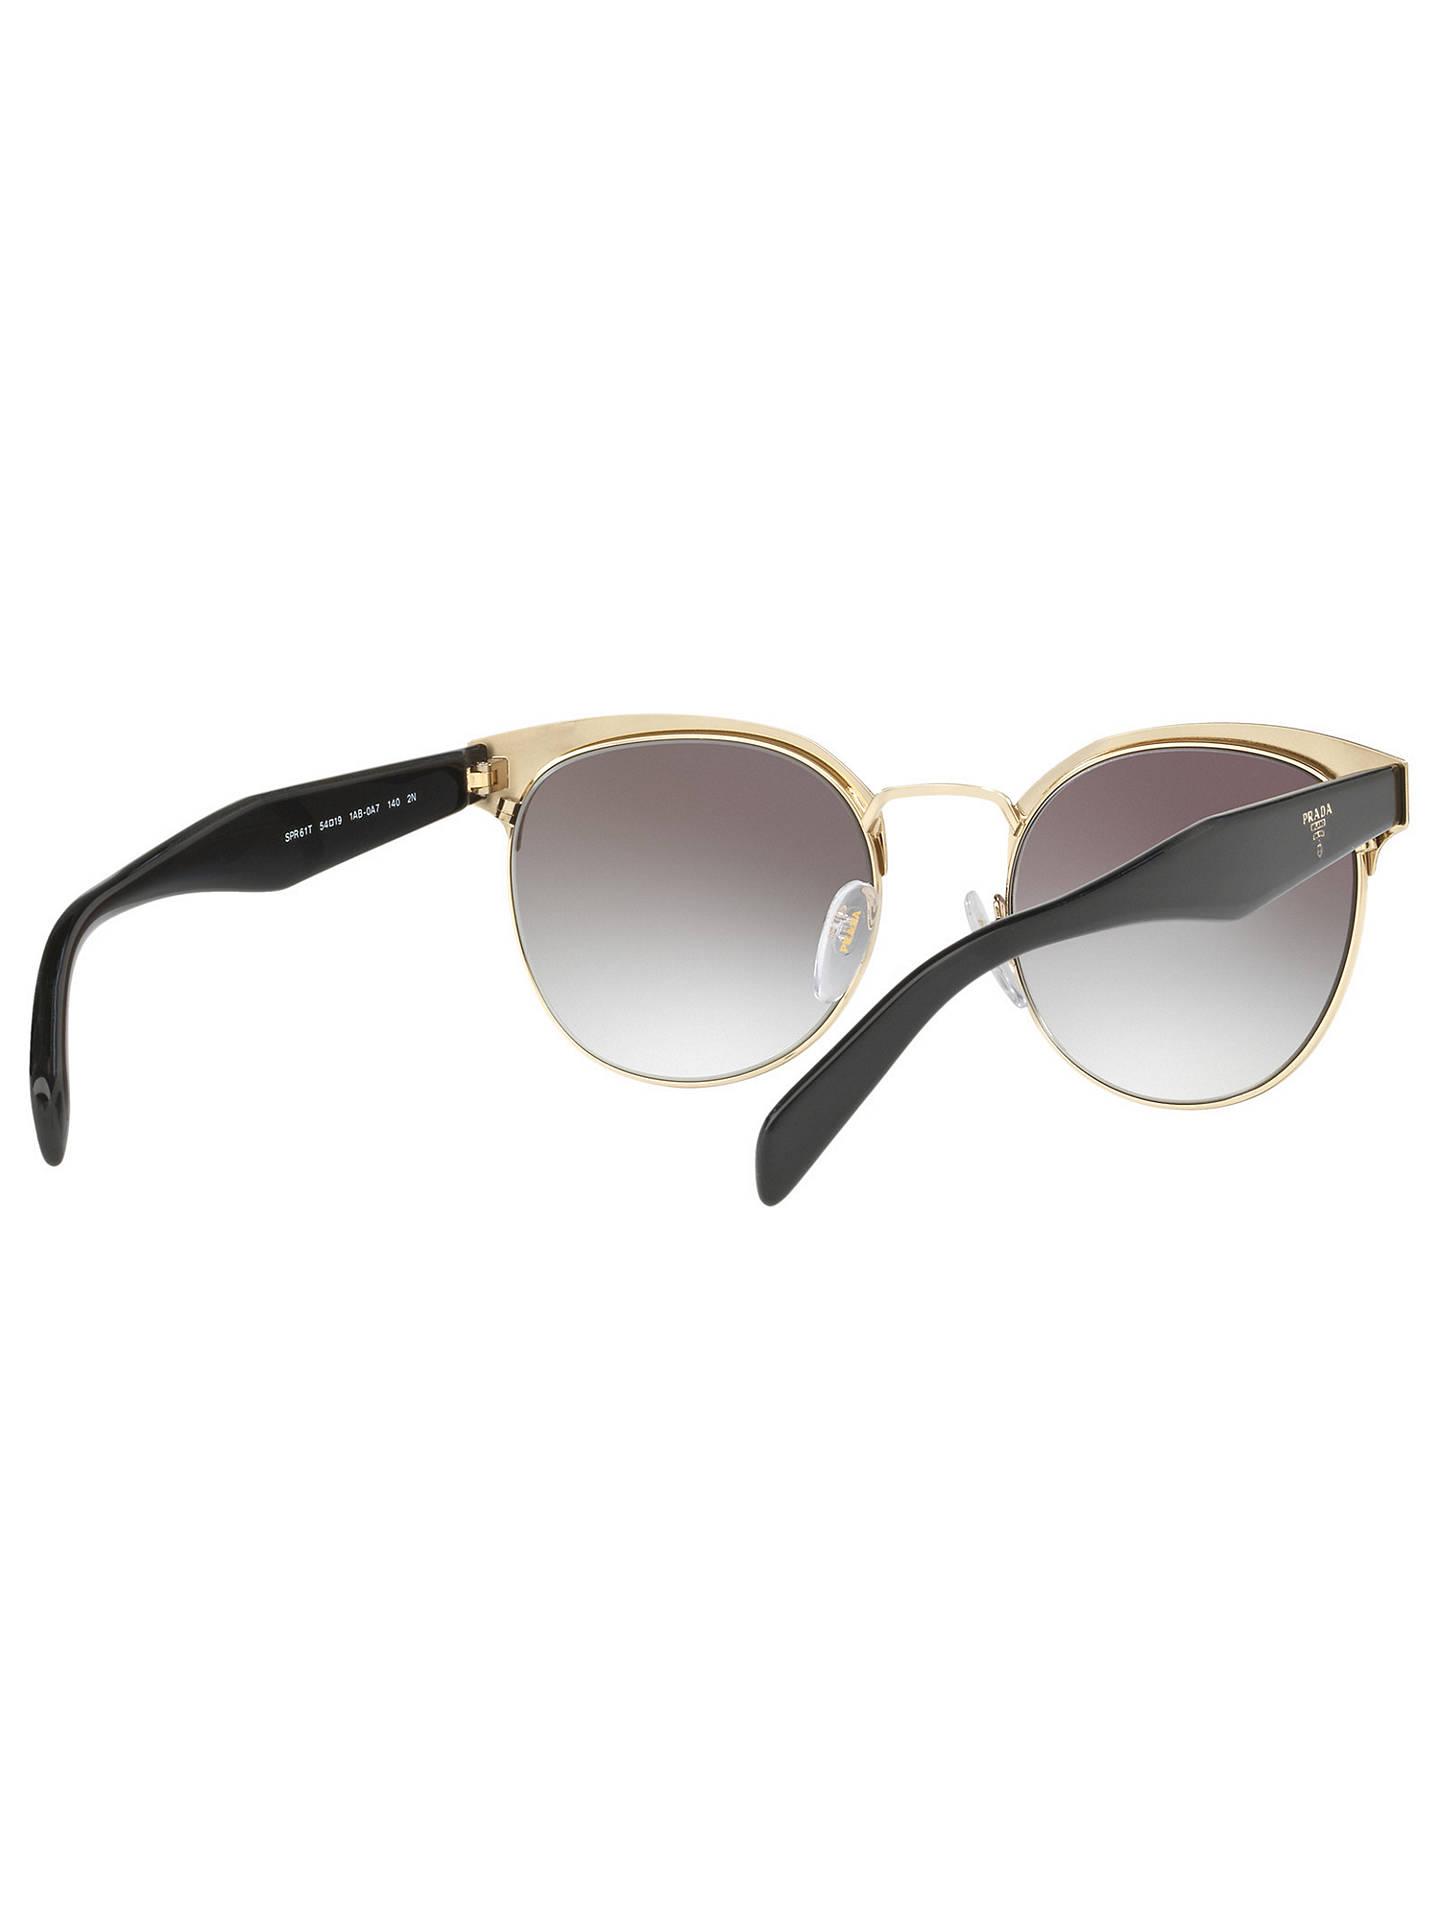 a7d33216c5 Prada PR 61TS Oval Sunglasses at John Lewis   Partners